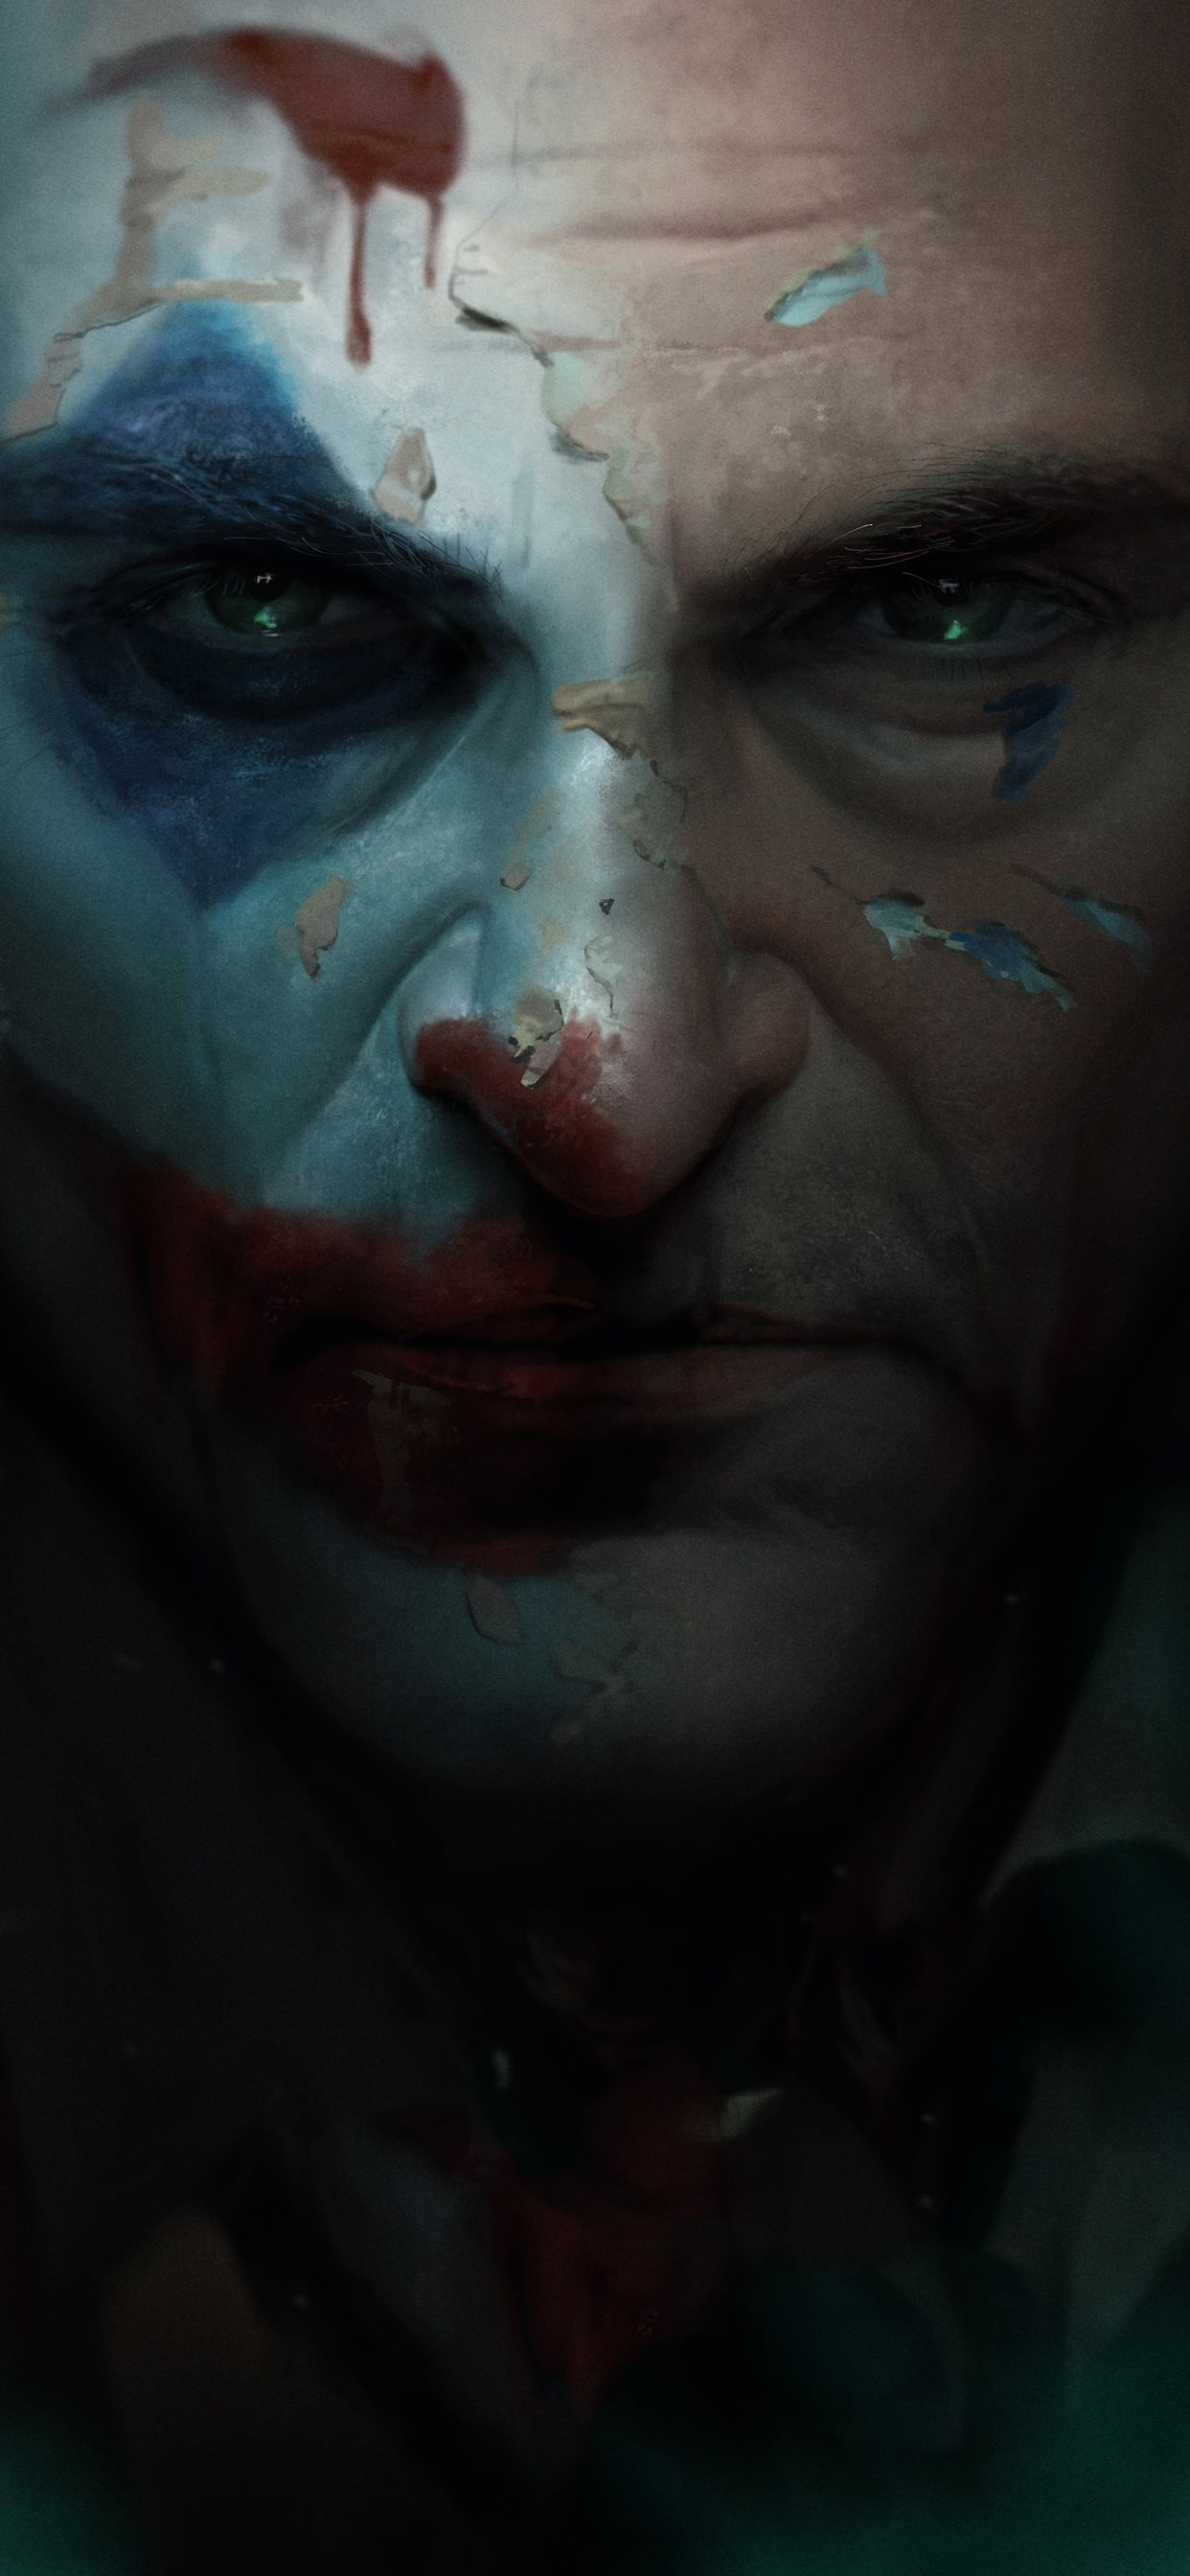 Joker Movie Closeup Art Iphone 11 Wallpapers Free Download